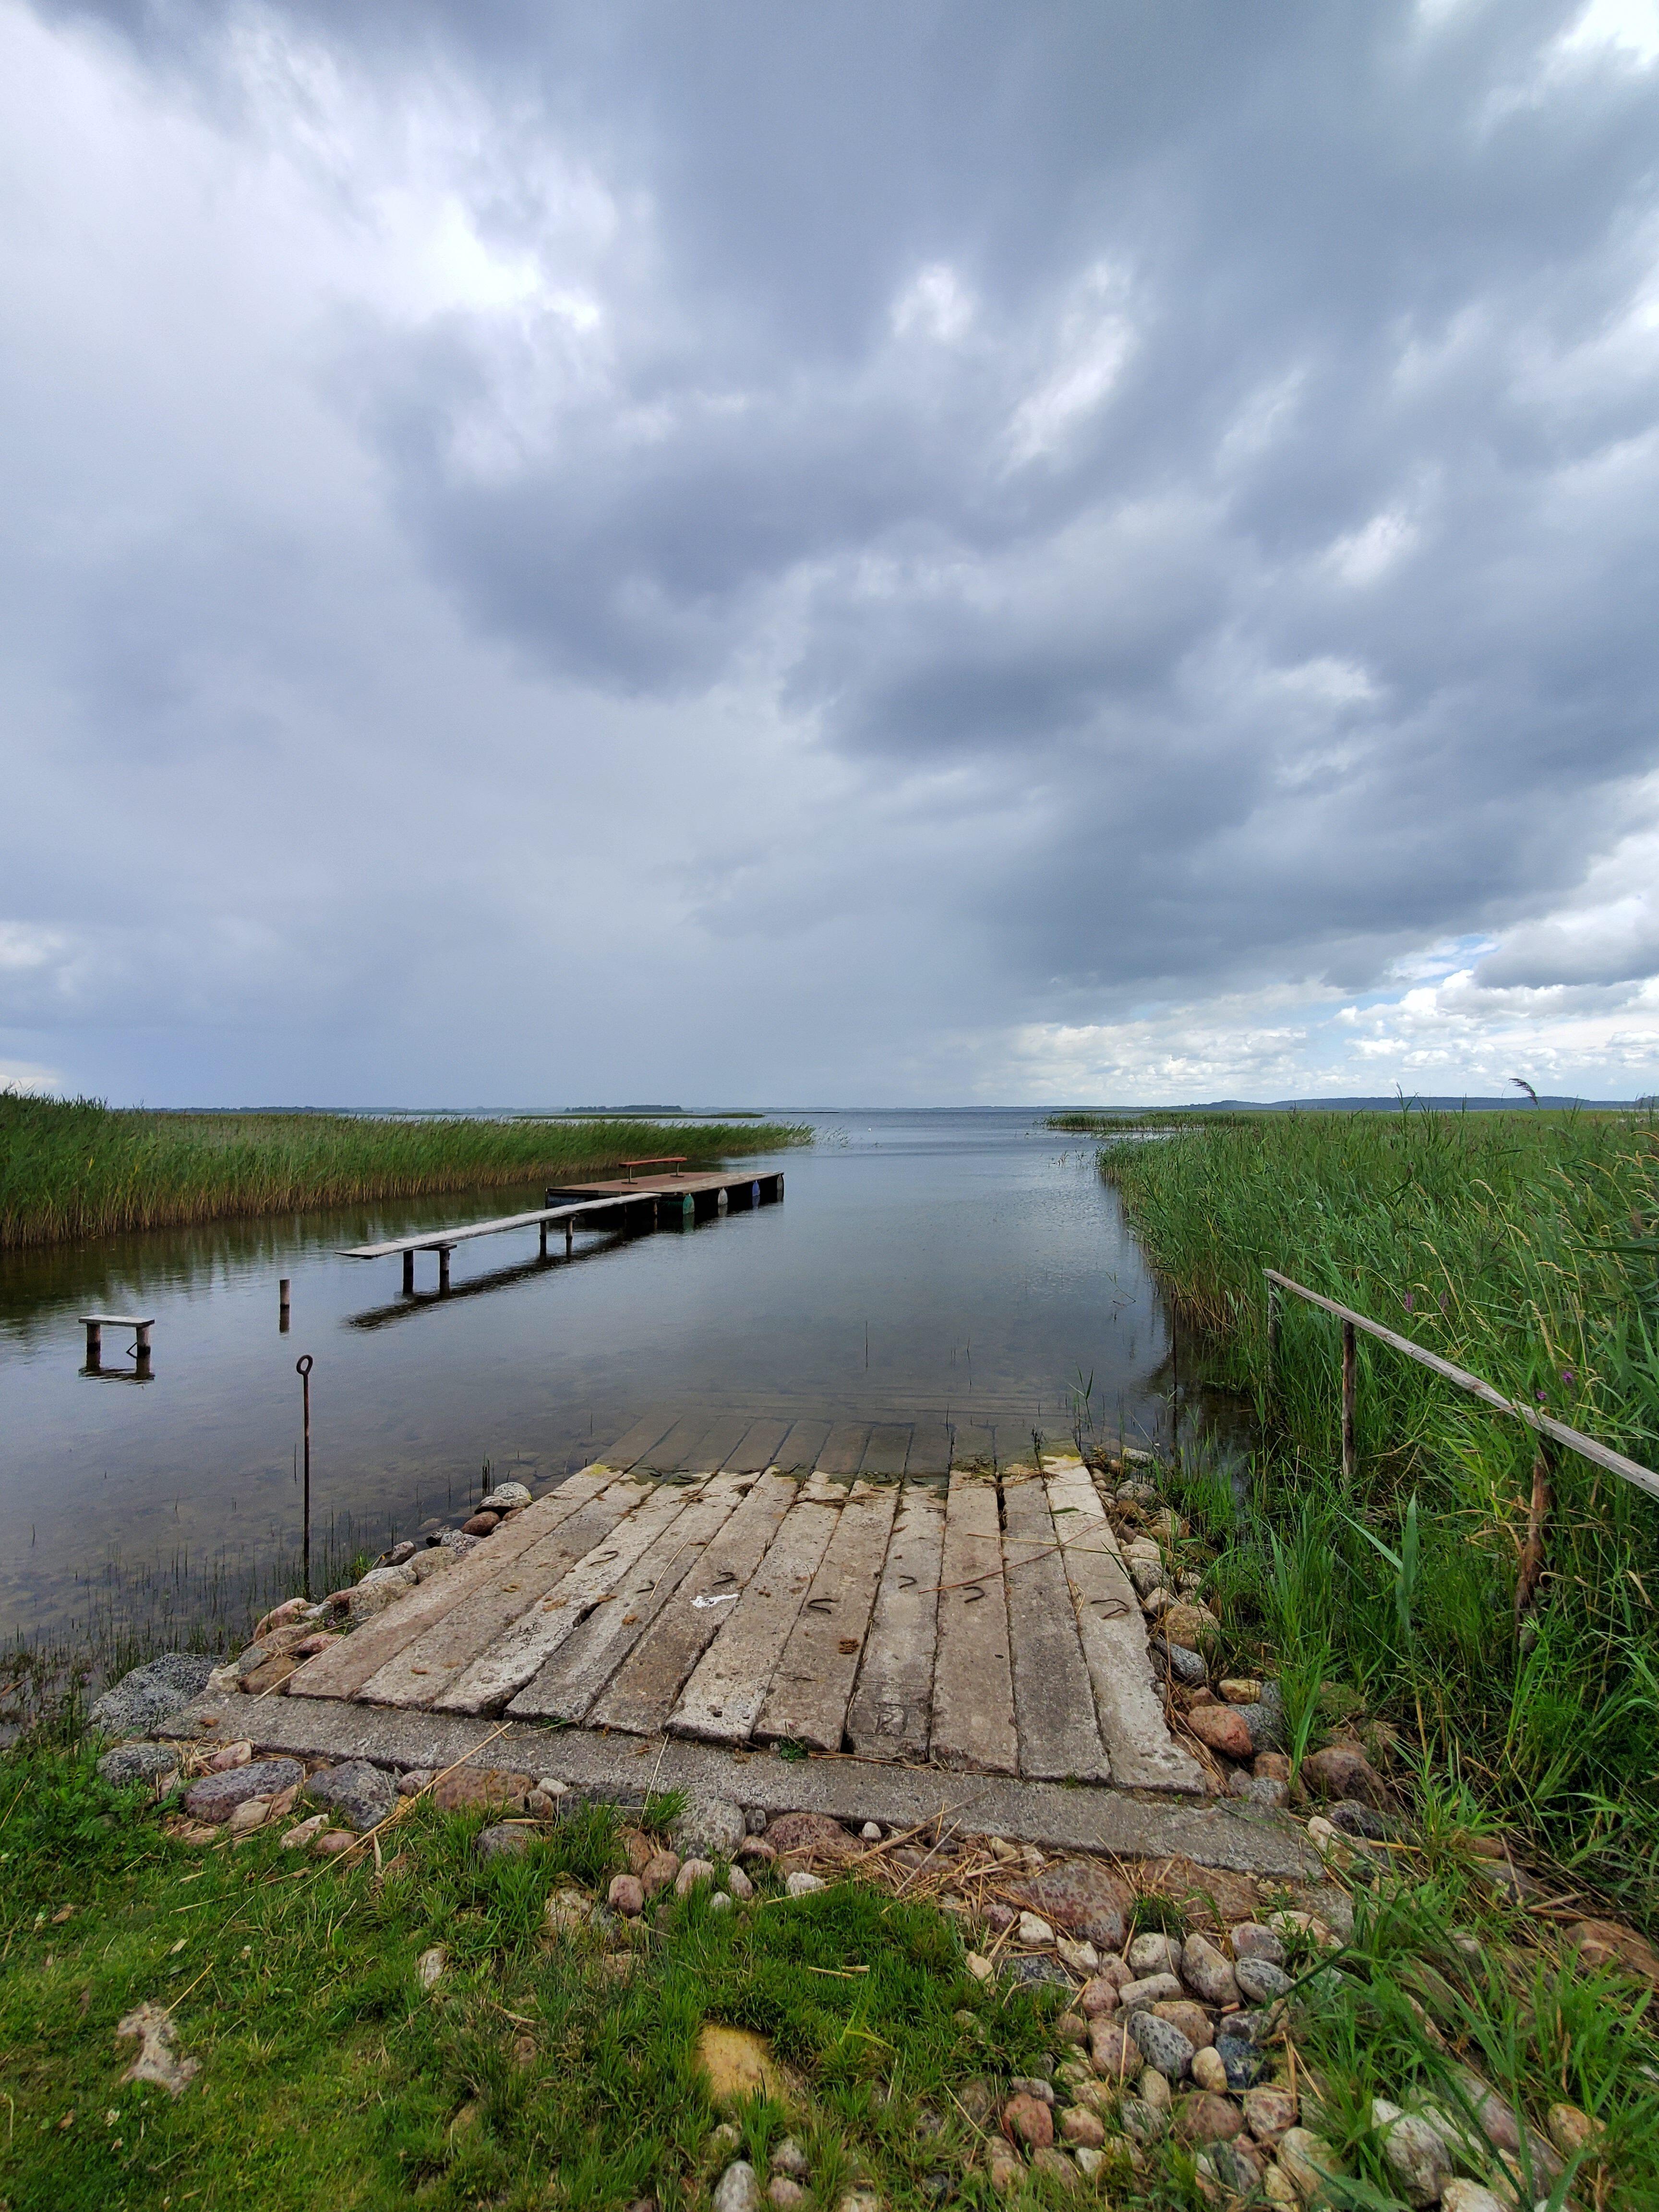 20200730 130008 rotated - Озеро Снуды